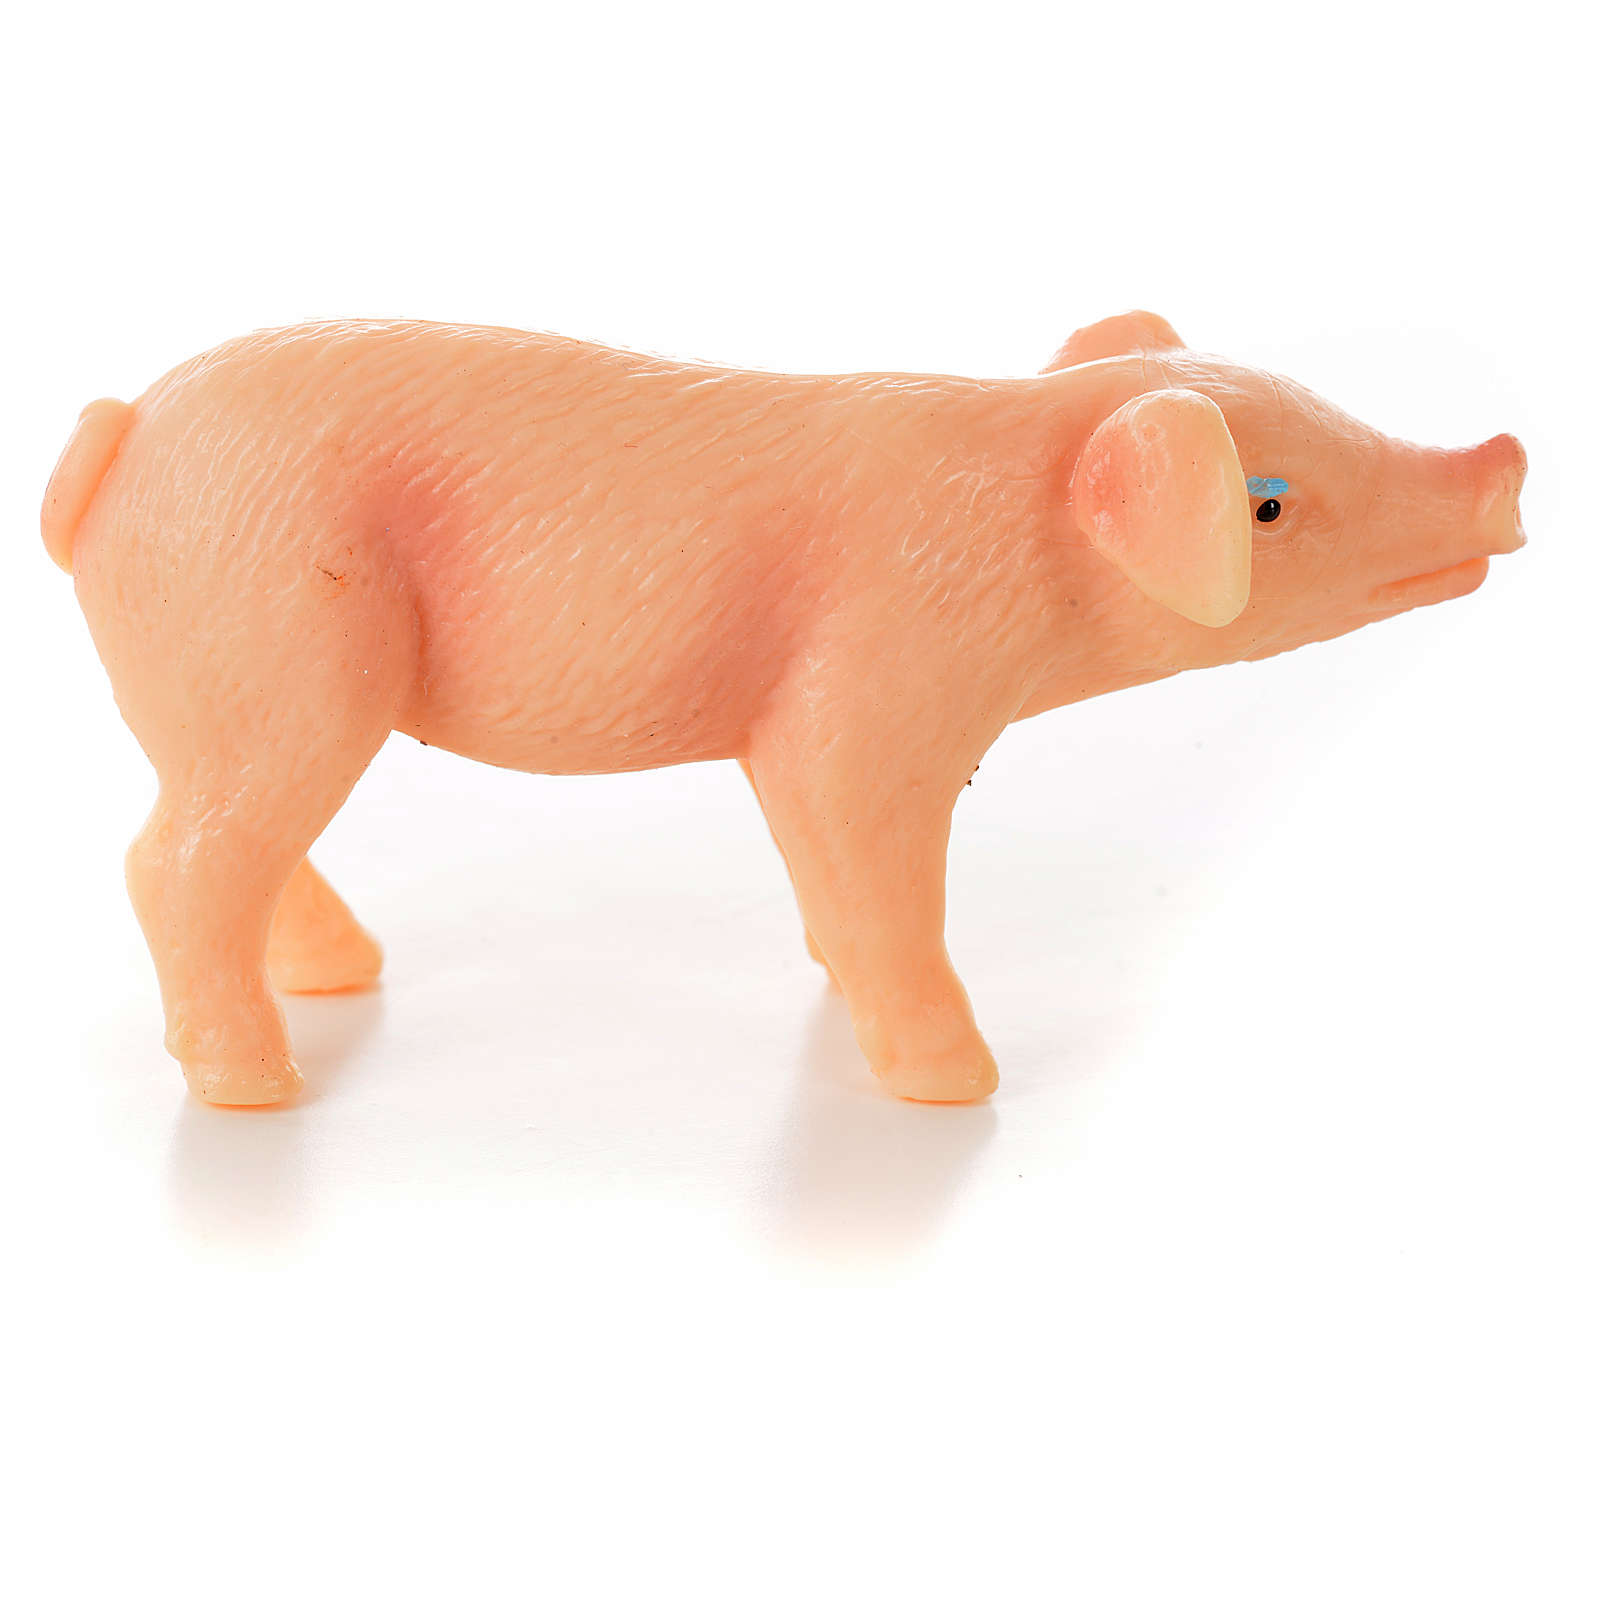 Nativity figurine, pig in resin 6-8-10 cm 3